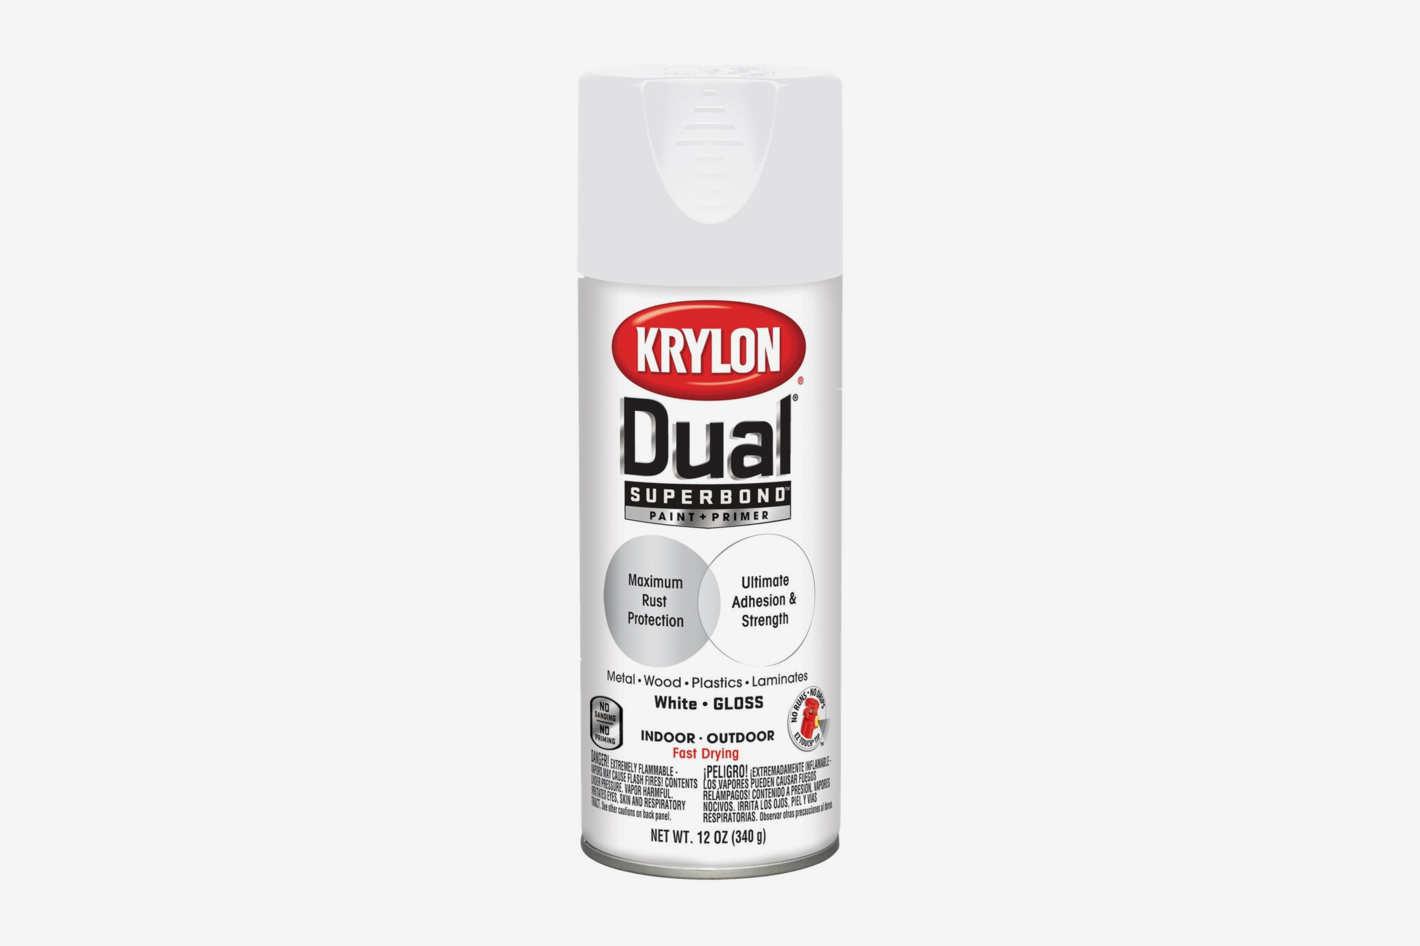 Krylon K08800007 'Dual' Superbond Paint and Primer, Gloss White, 12 Ounce